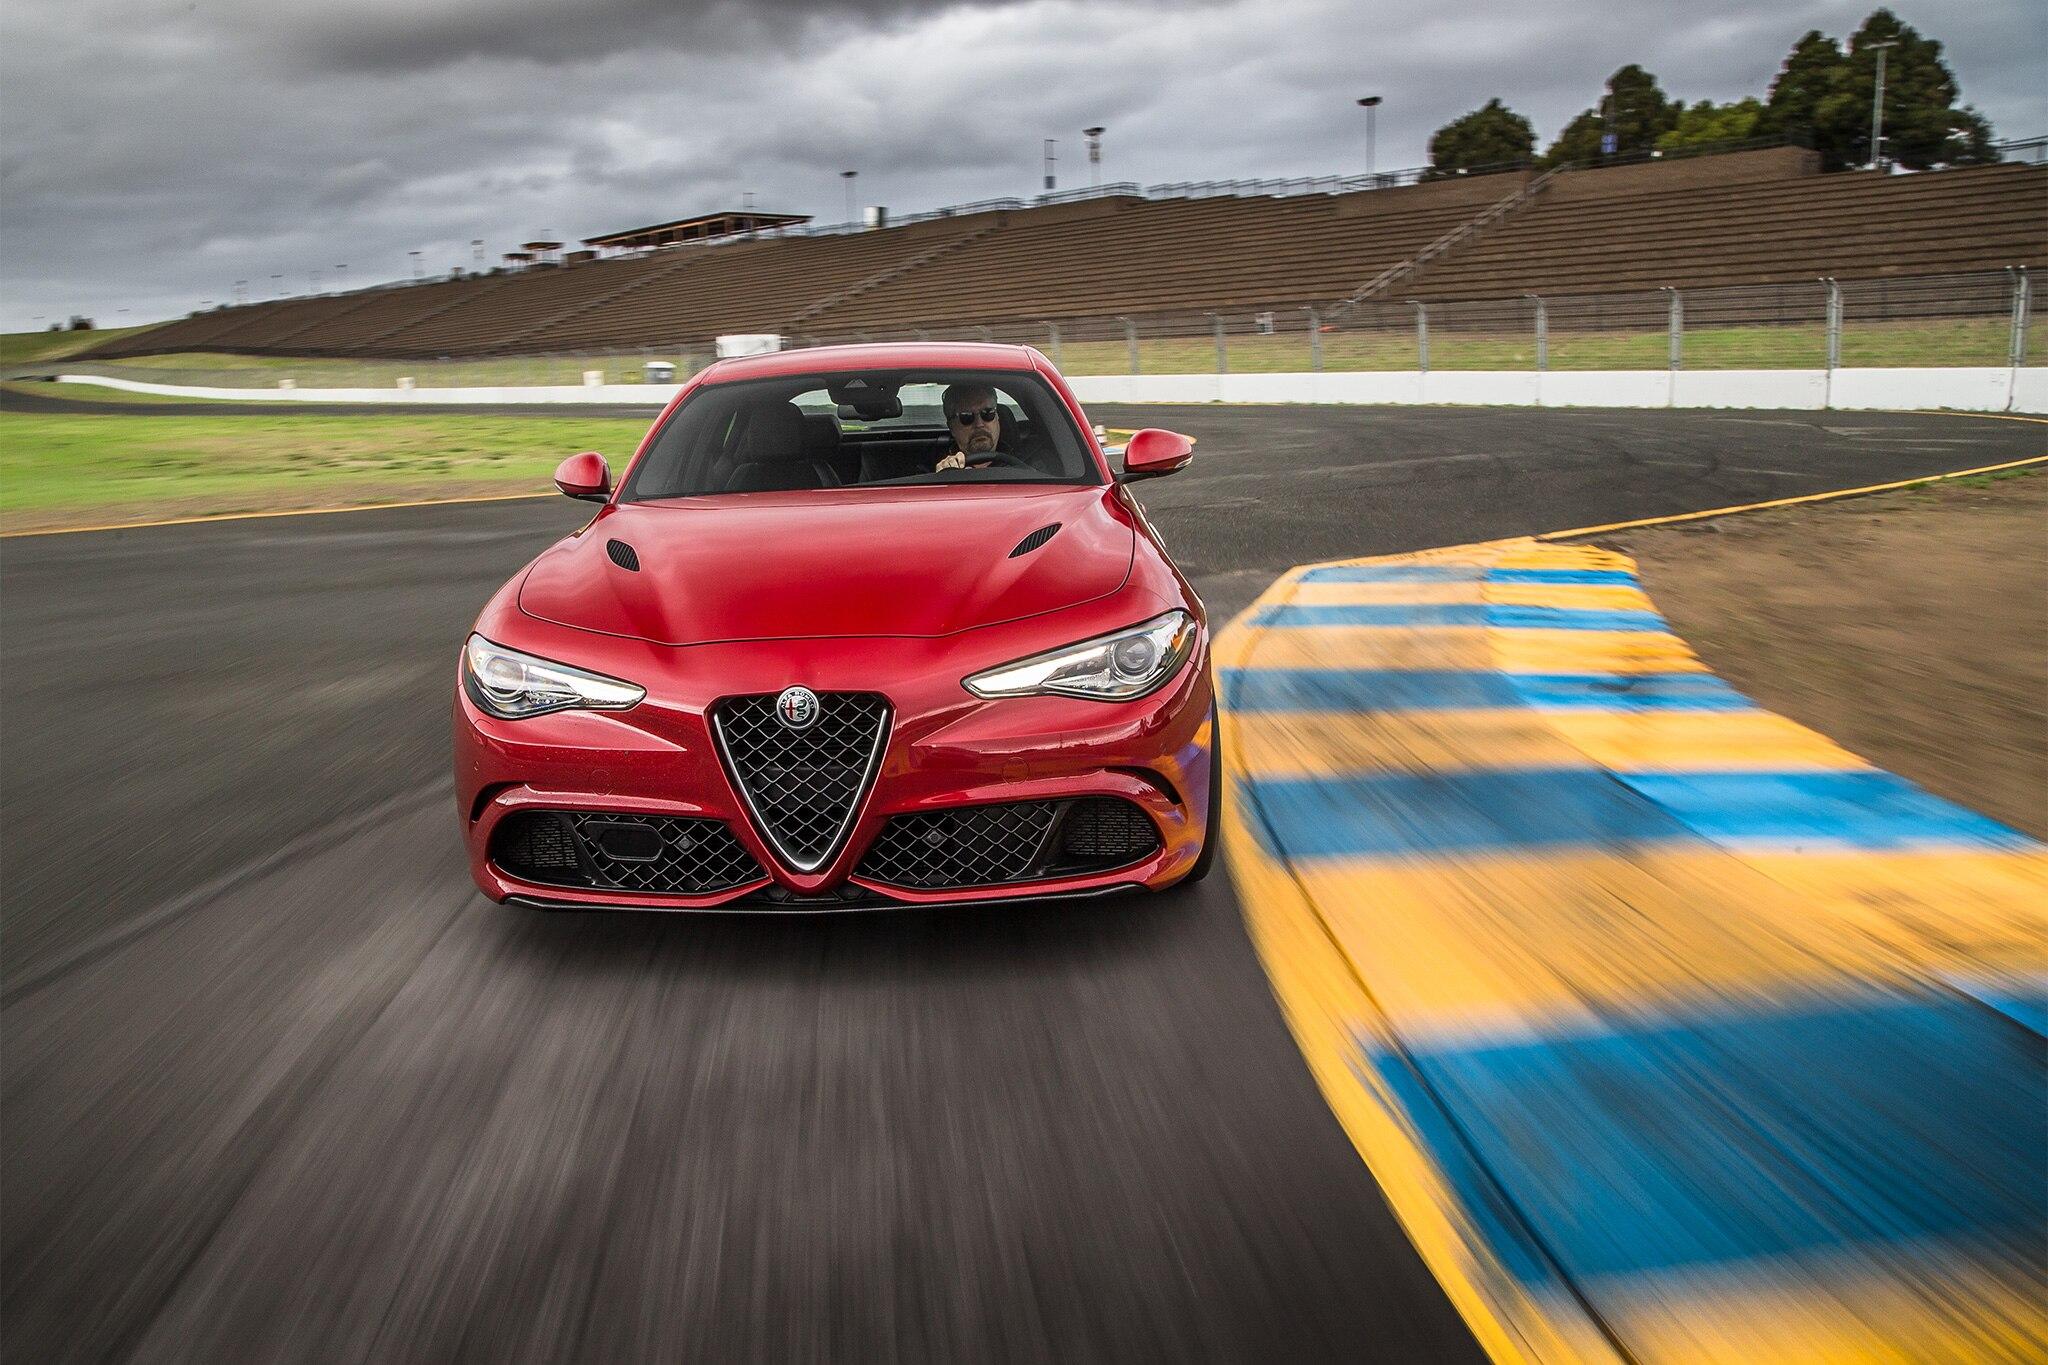 Lastest 2017 Alfa Romeo Giulia Quadrifoglio US Spec First Drive